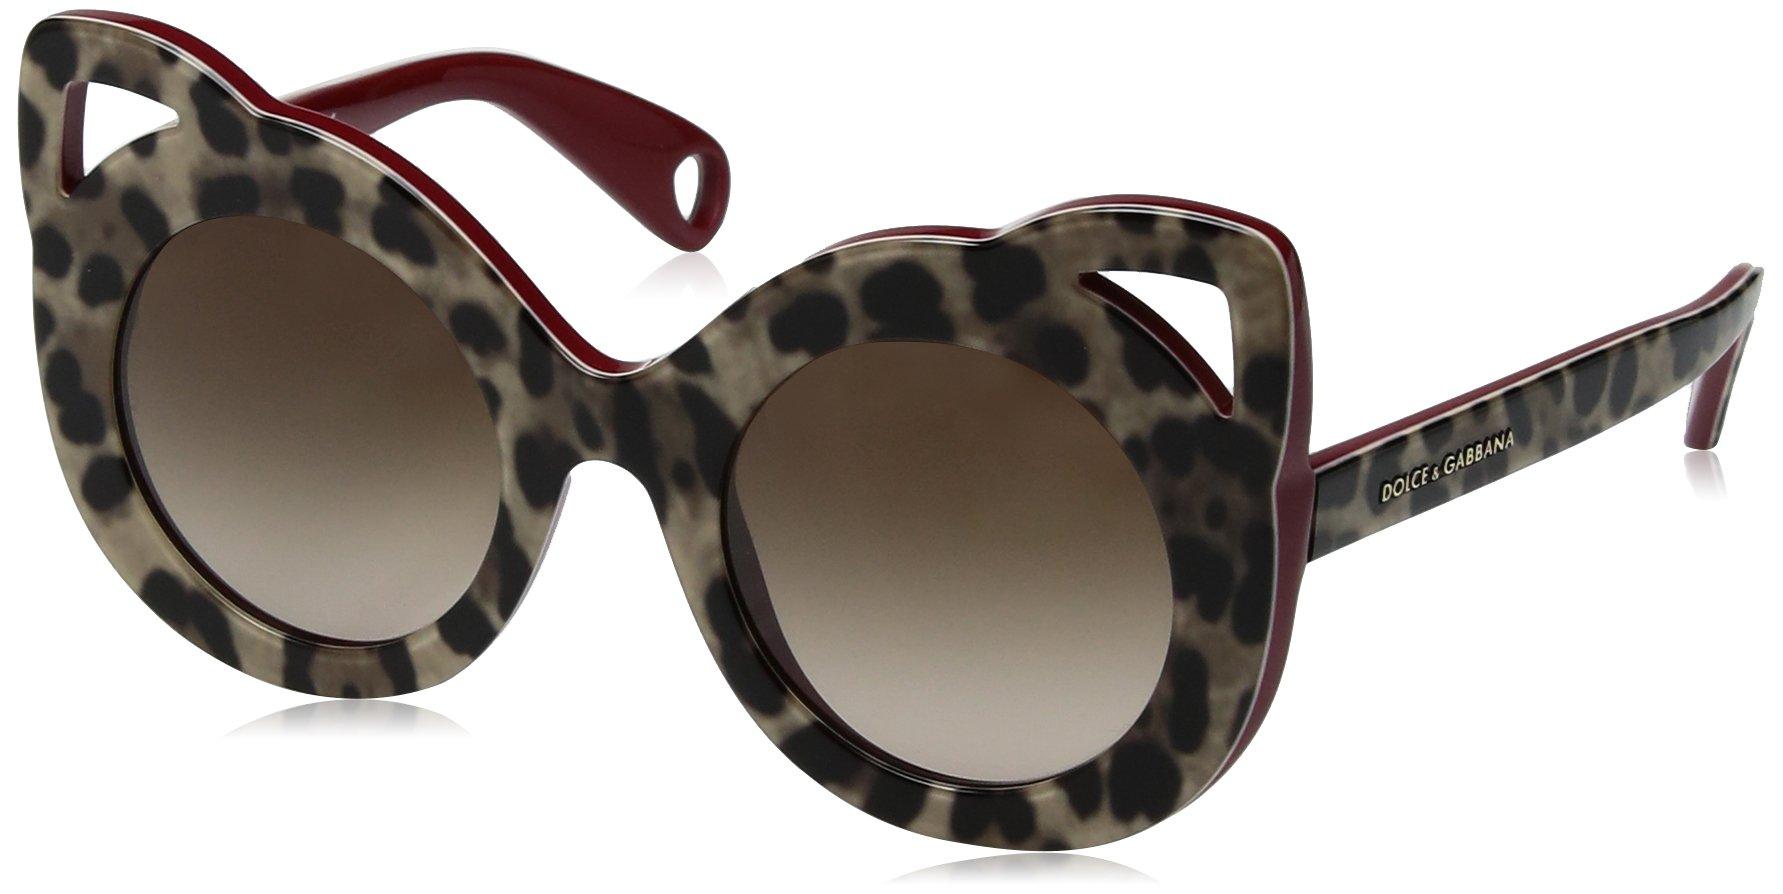 Dolce & Gabbana Women's Acetate Woman Round Sunglasses, Top Leo on Bordeaux, 43 mm